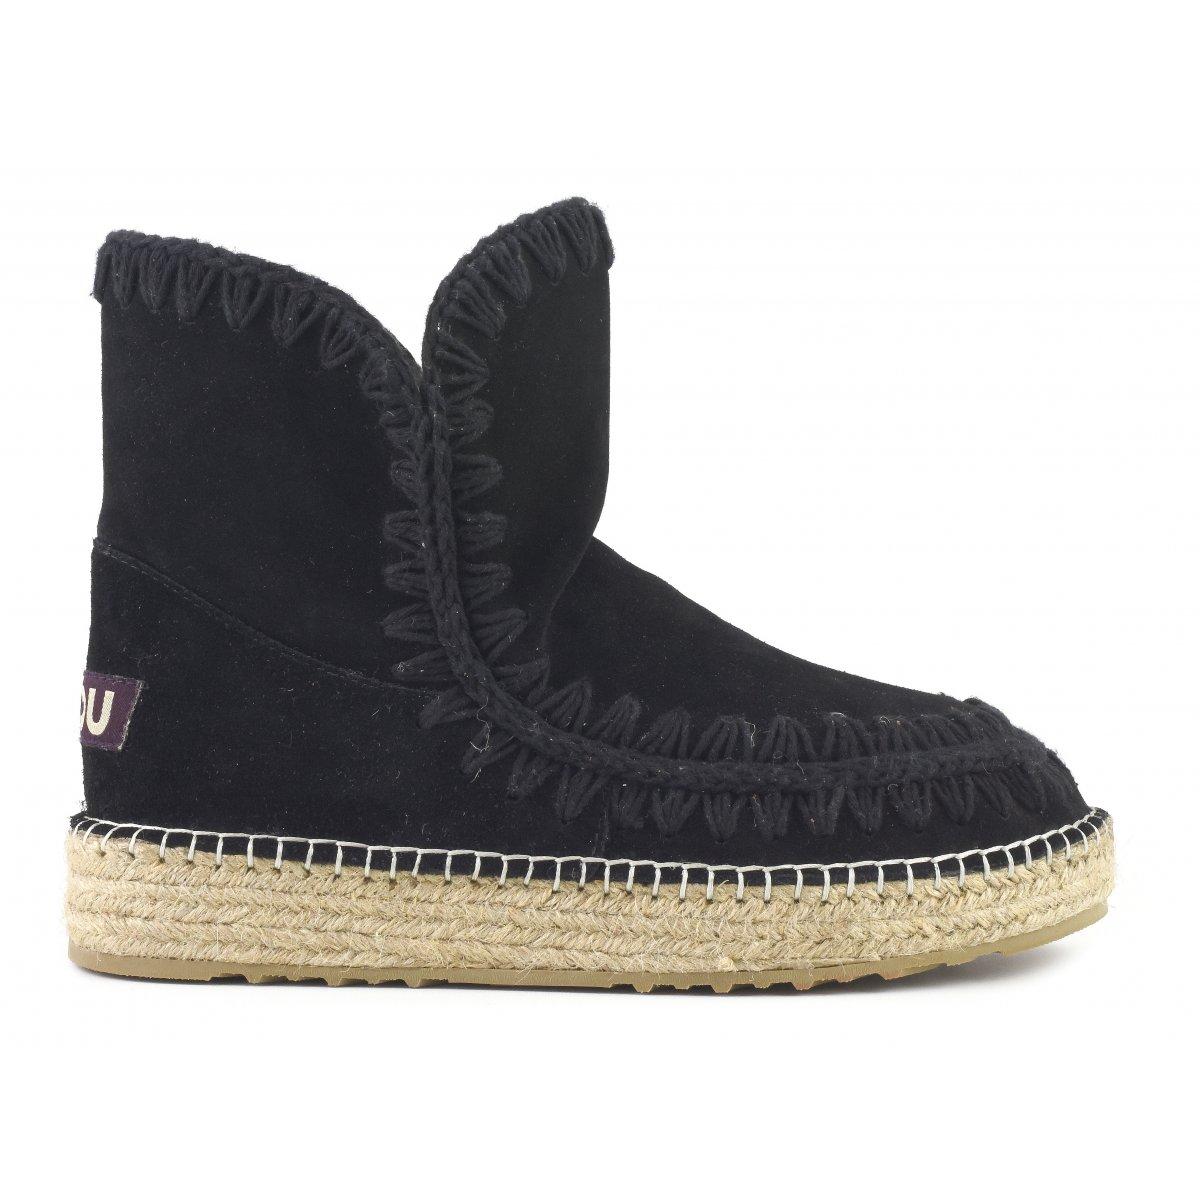 6100f9ea3f1 eskimo 18 jute suede - ankle boots mou women spring summer